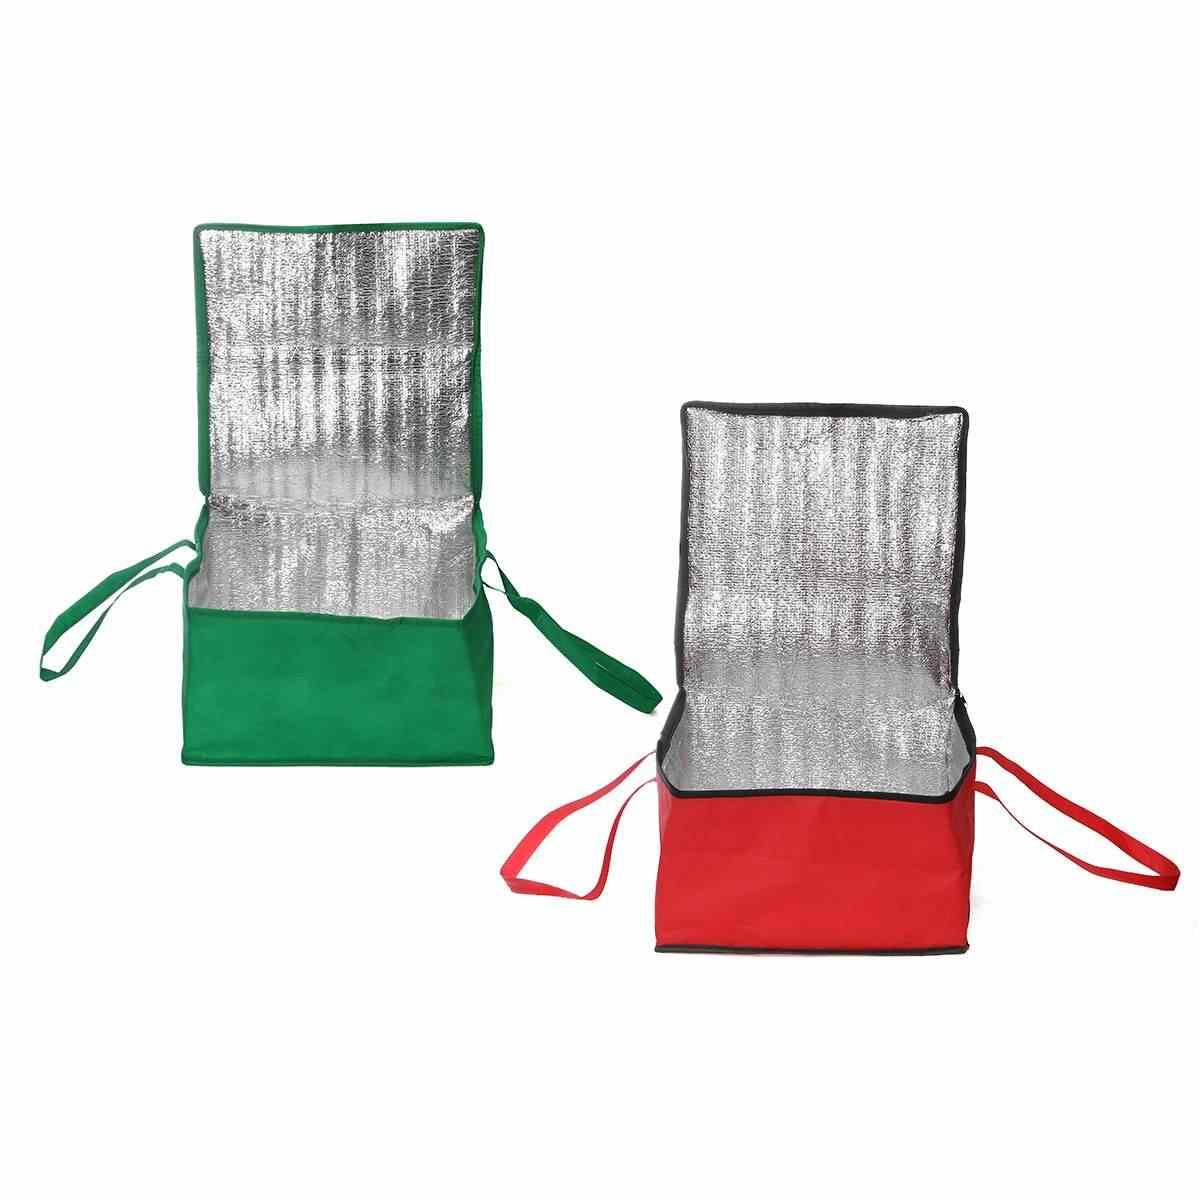 32L impermeable bolsa aislante para el almuerzo bolsa de aislamiento plegable de Picnic bolsa de hielo portátil comida térmica bolsa de entrega de Pizza